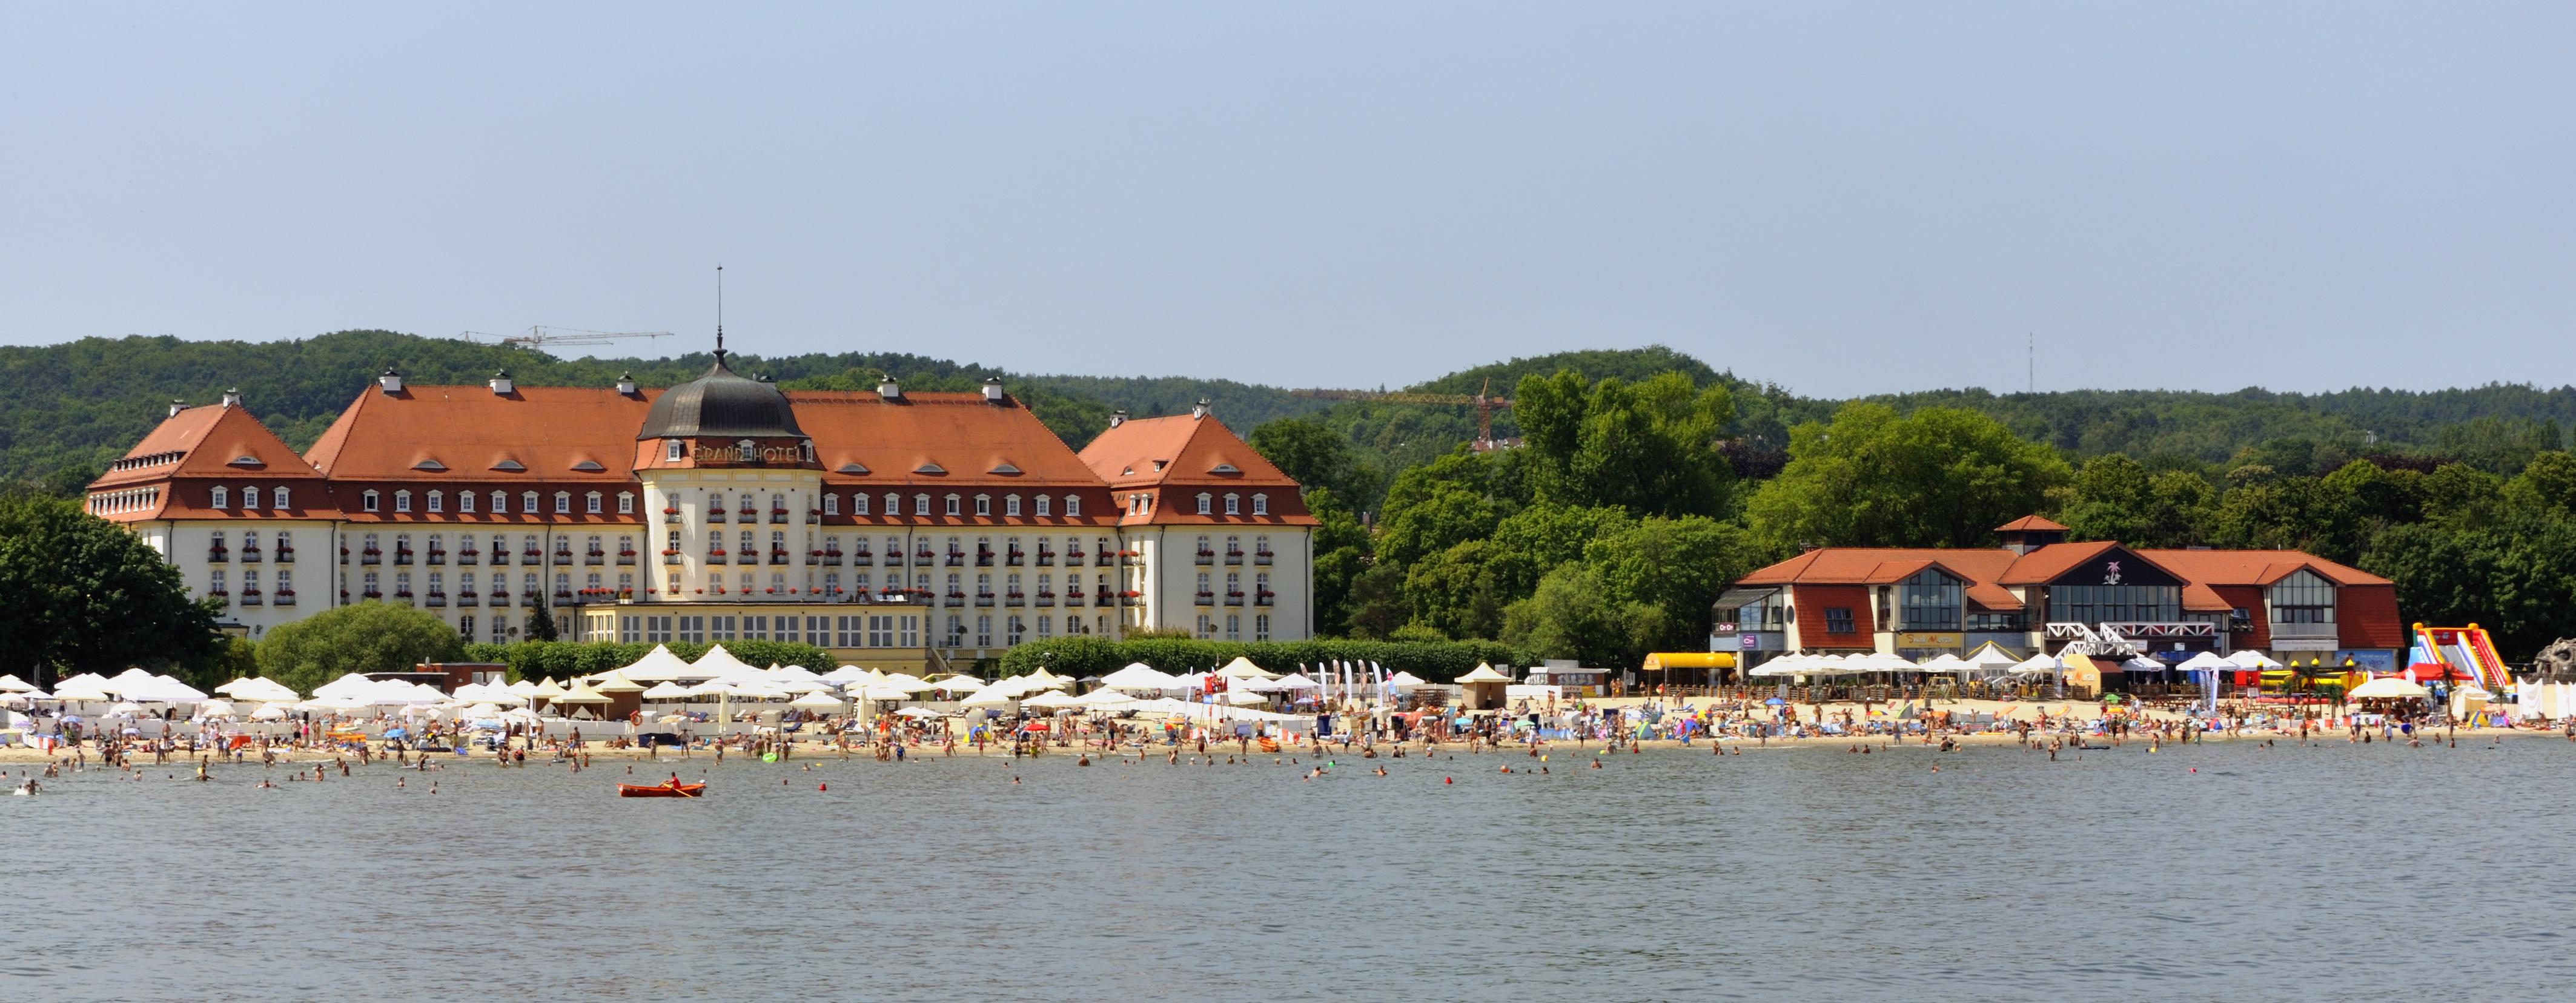 Grand Beach Hotel Surfside Reviews